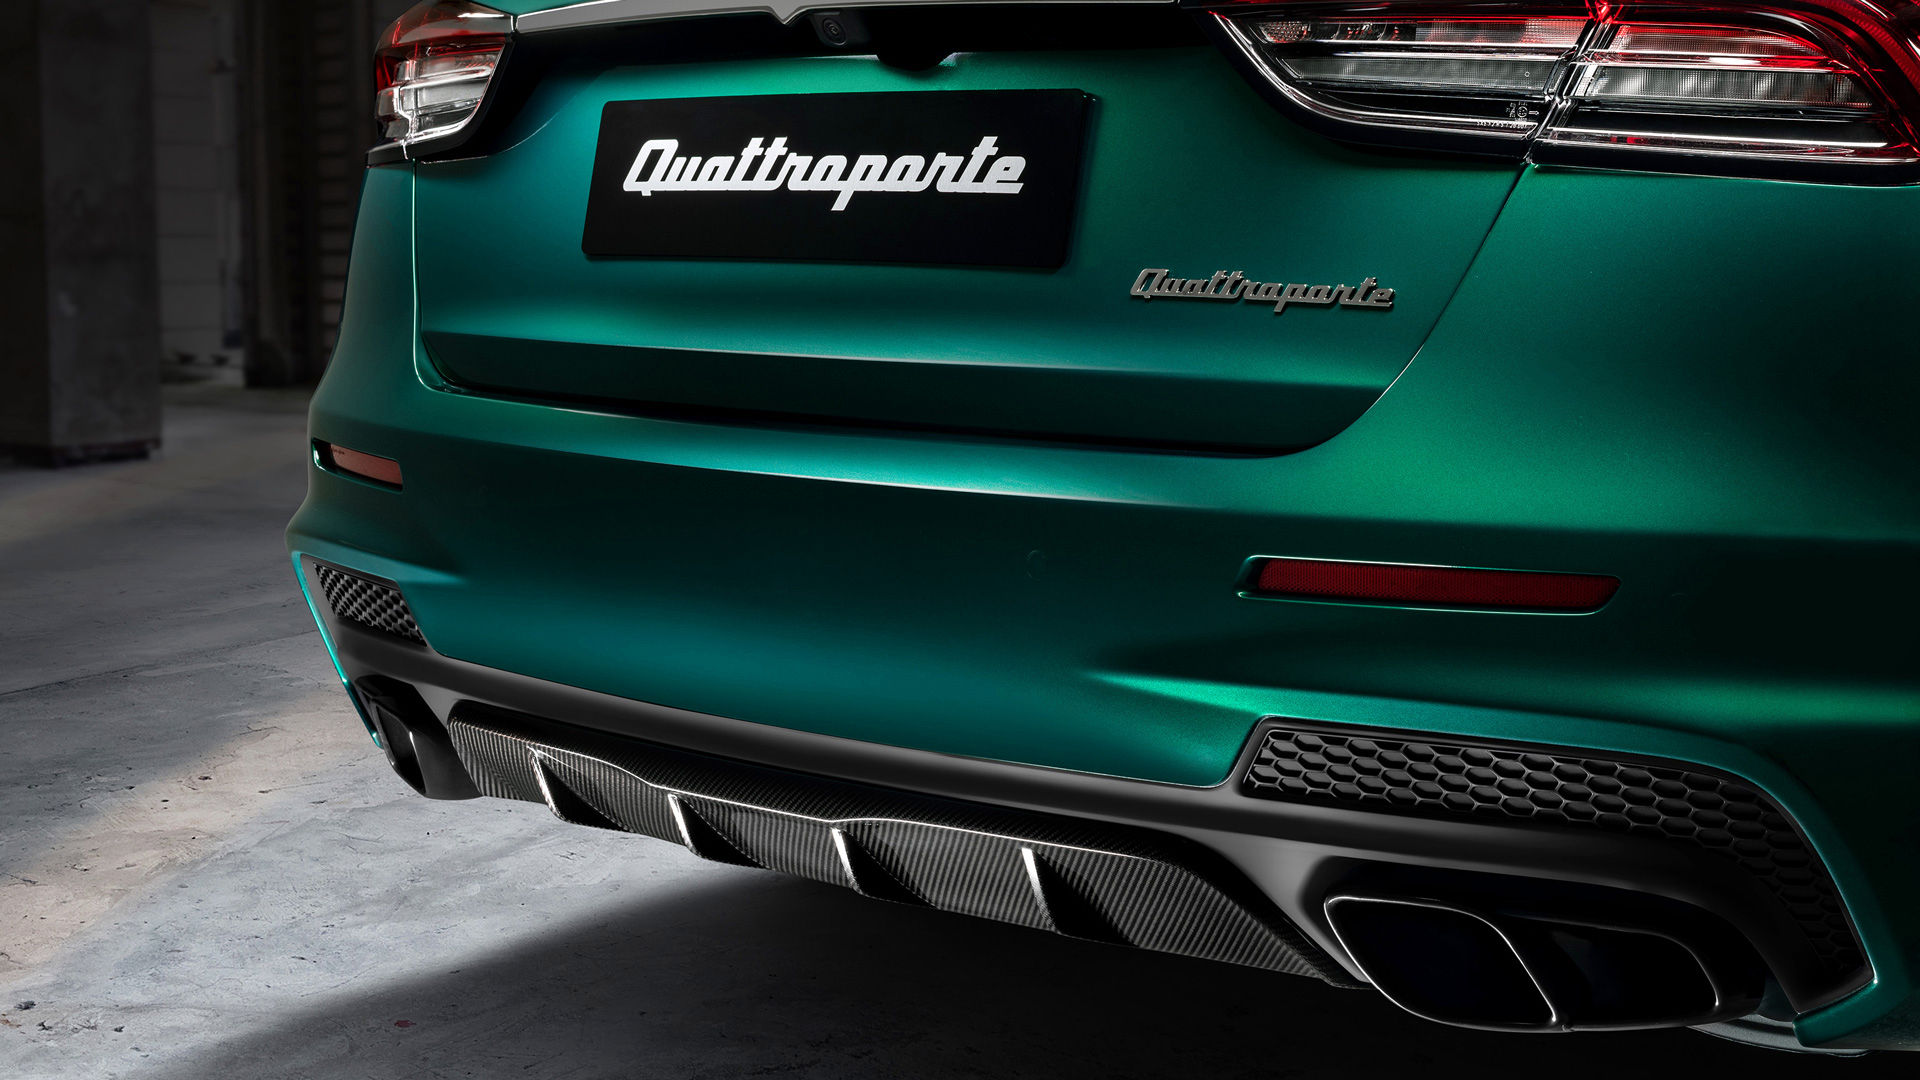 Maserati Quattroporte Trofeo - Grün - Abgassystem, Auspuff